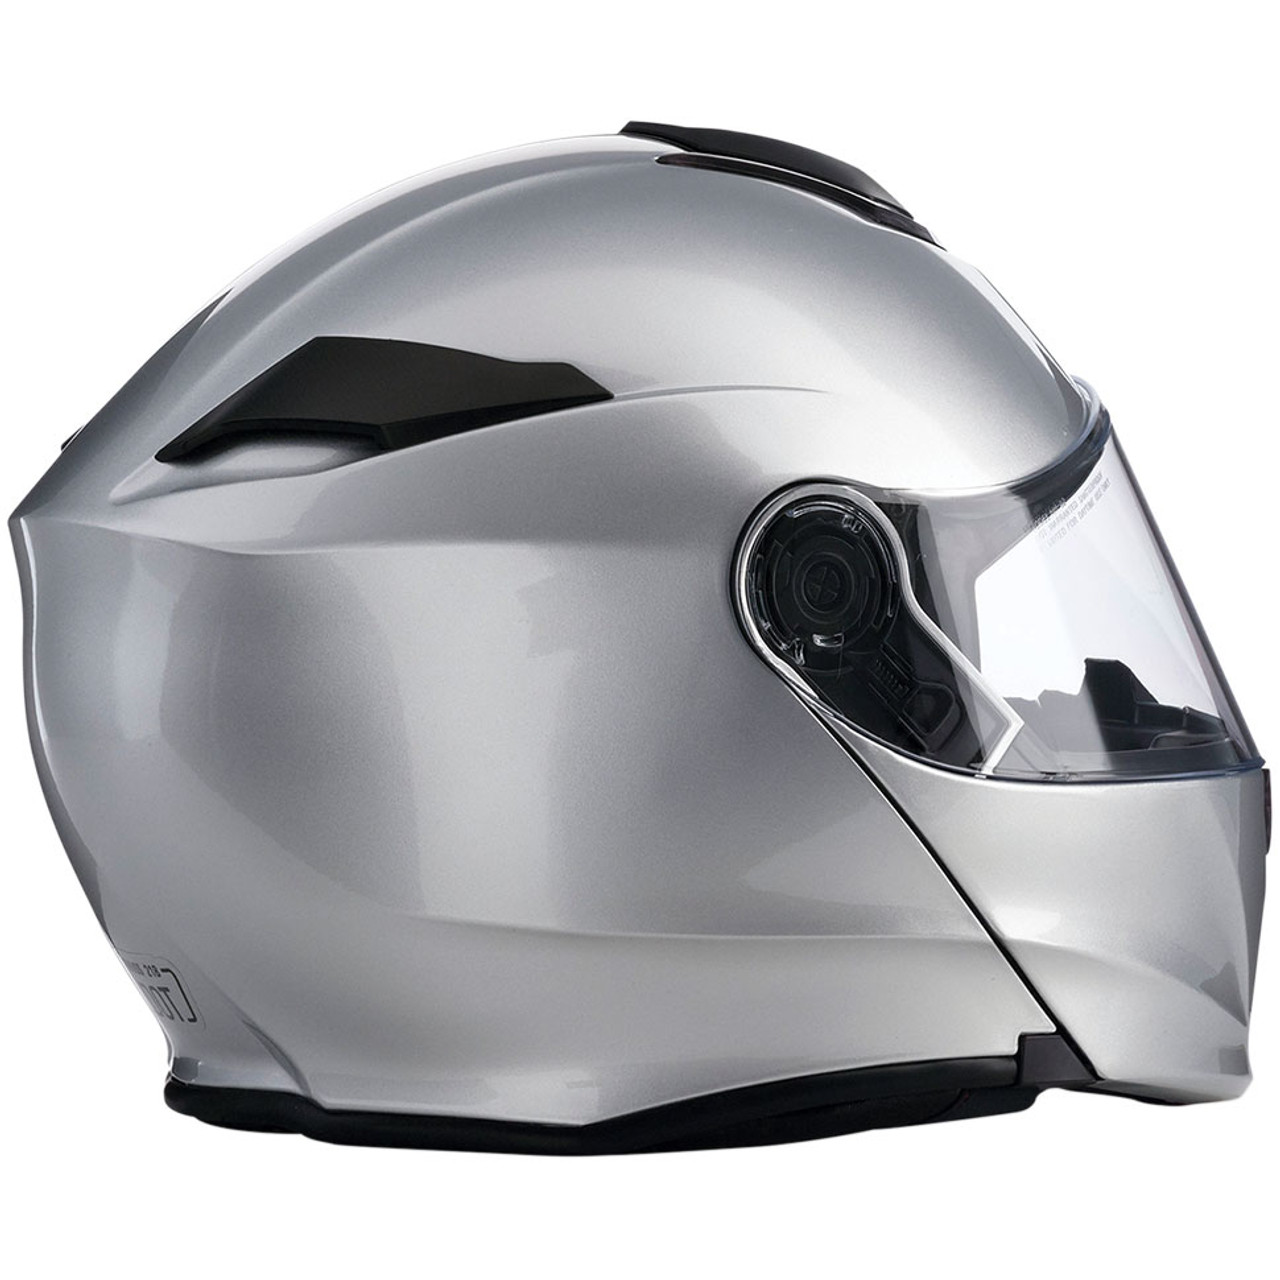 Flat Black Z1R SOLARIS Modular Helmet w// Drop-Down Sun Visor Choose Size